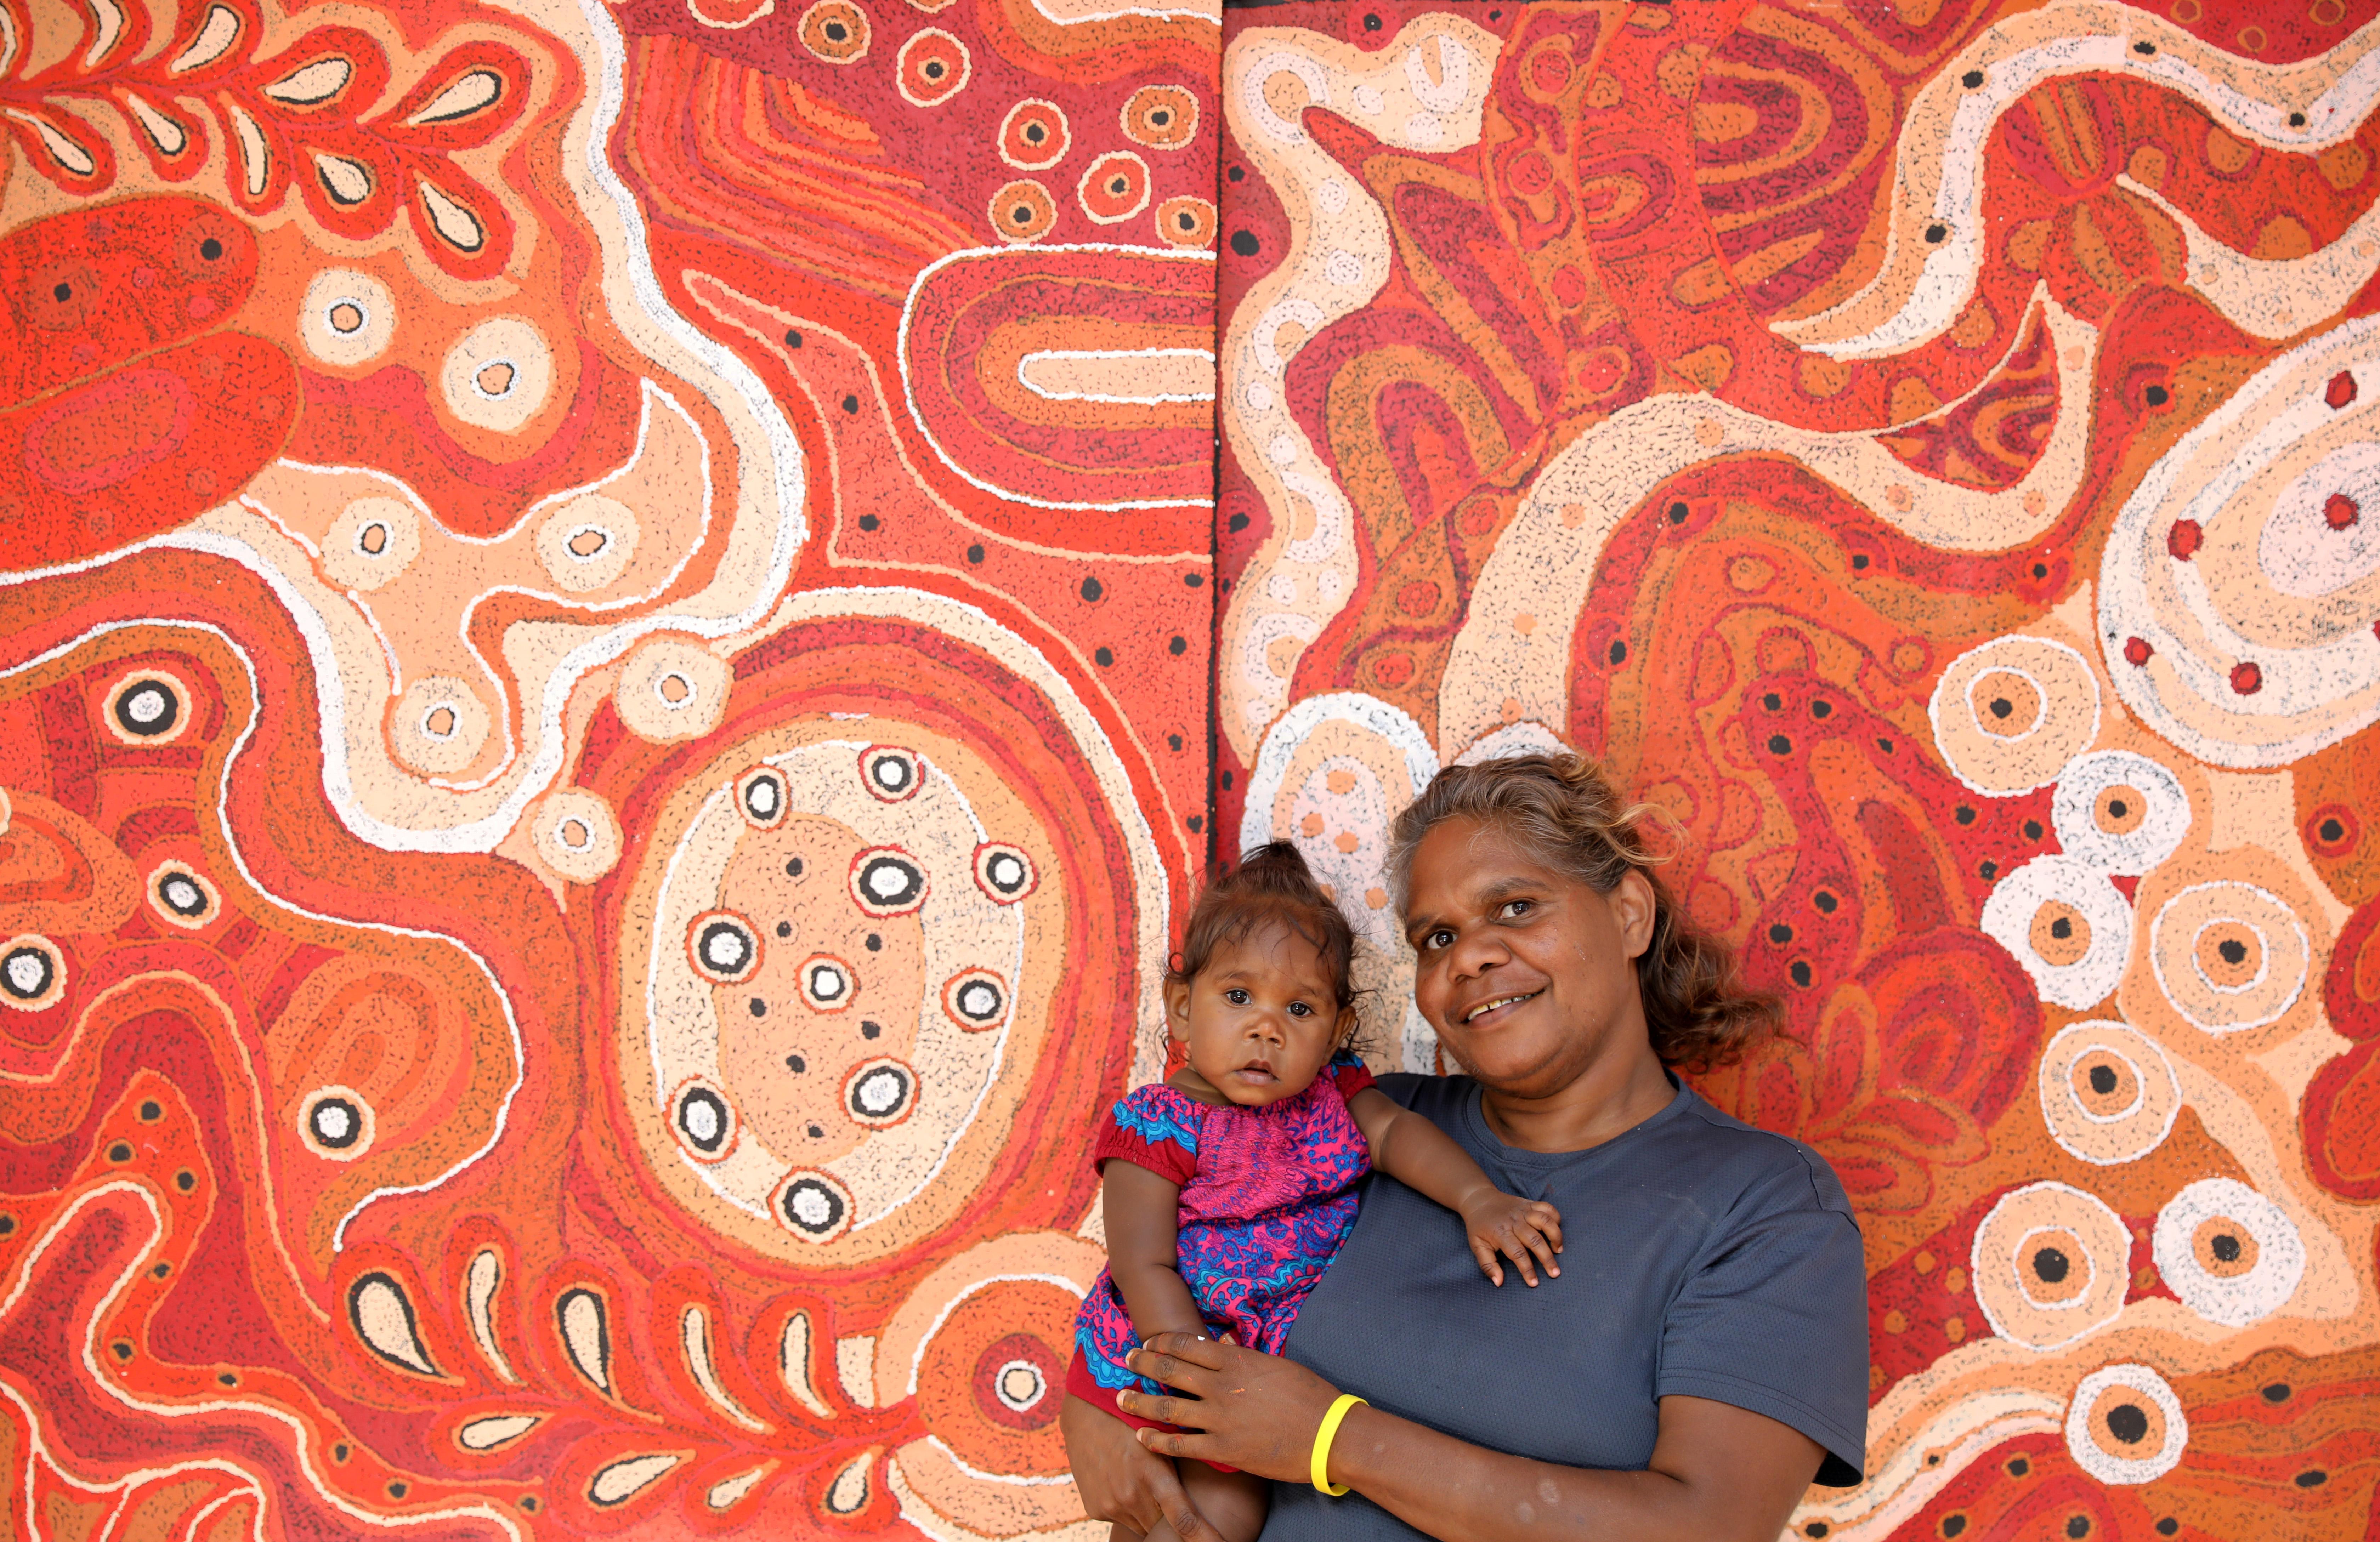 Anita Pumani and her granddaughter Anala in Mimili, photo: Mimili Maku Arts